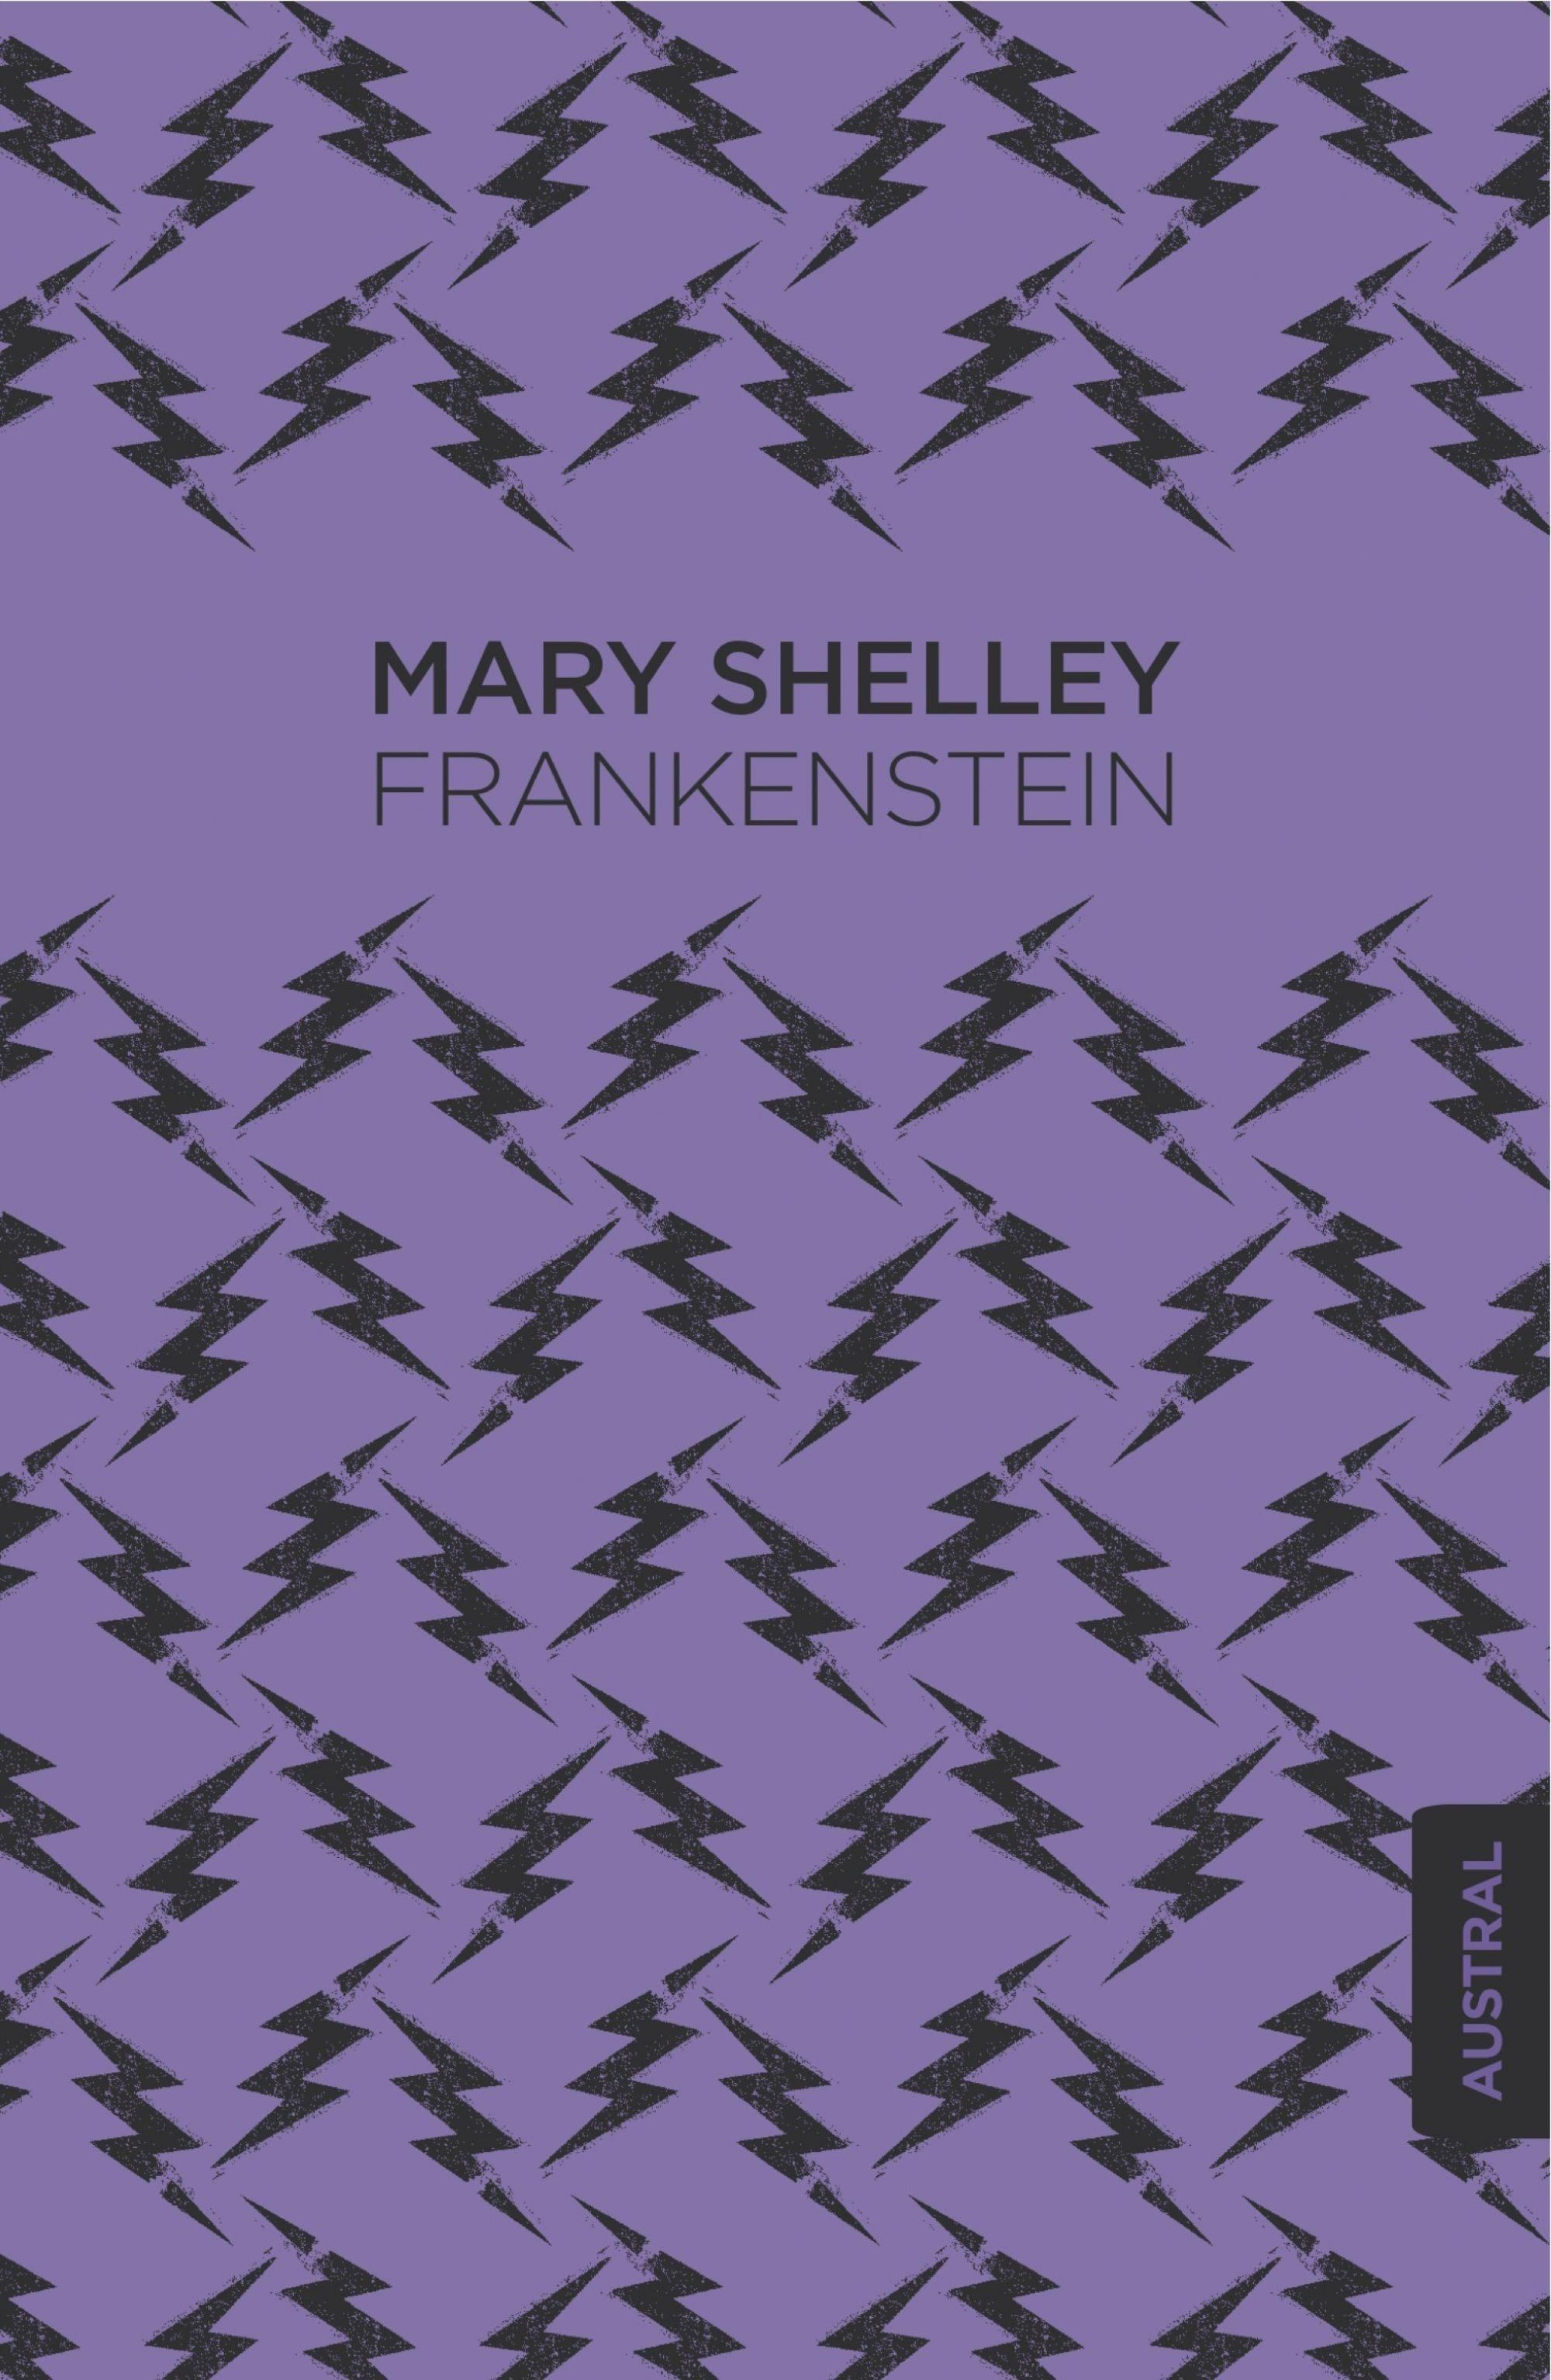 Frankenstein - Mary Shelley - Austral